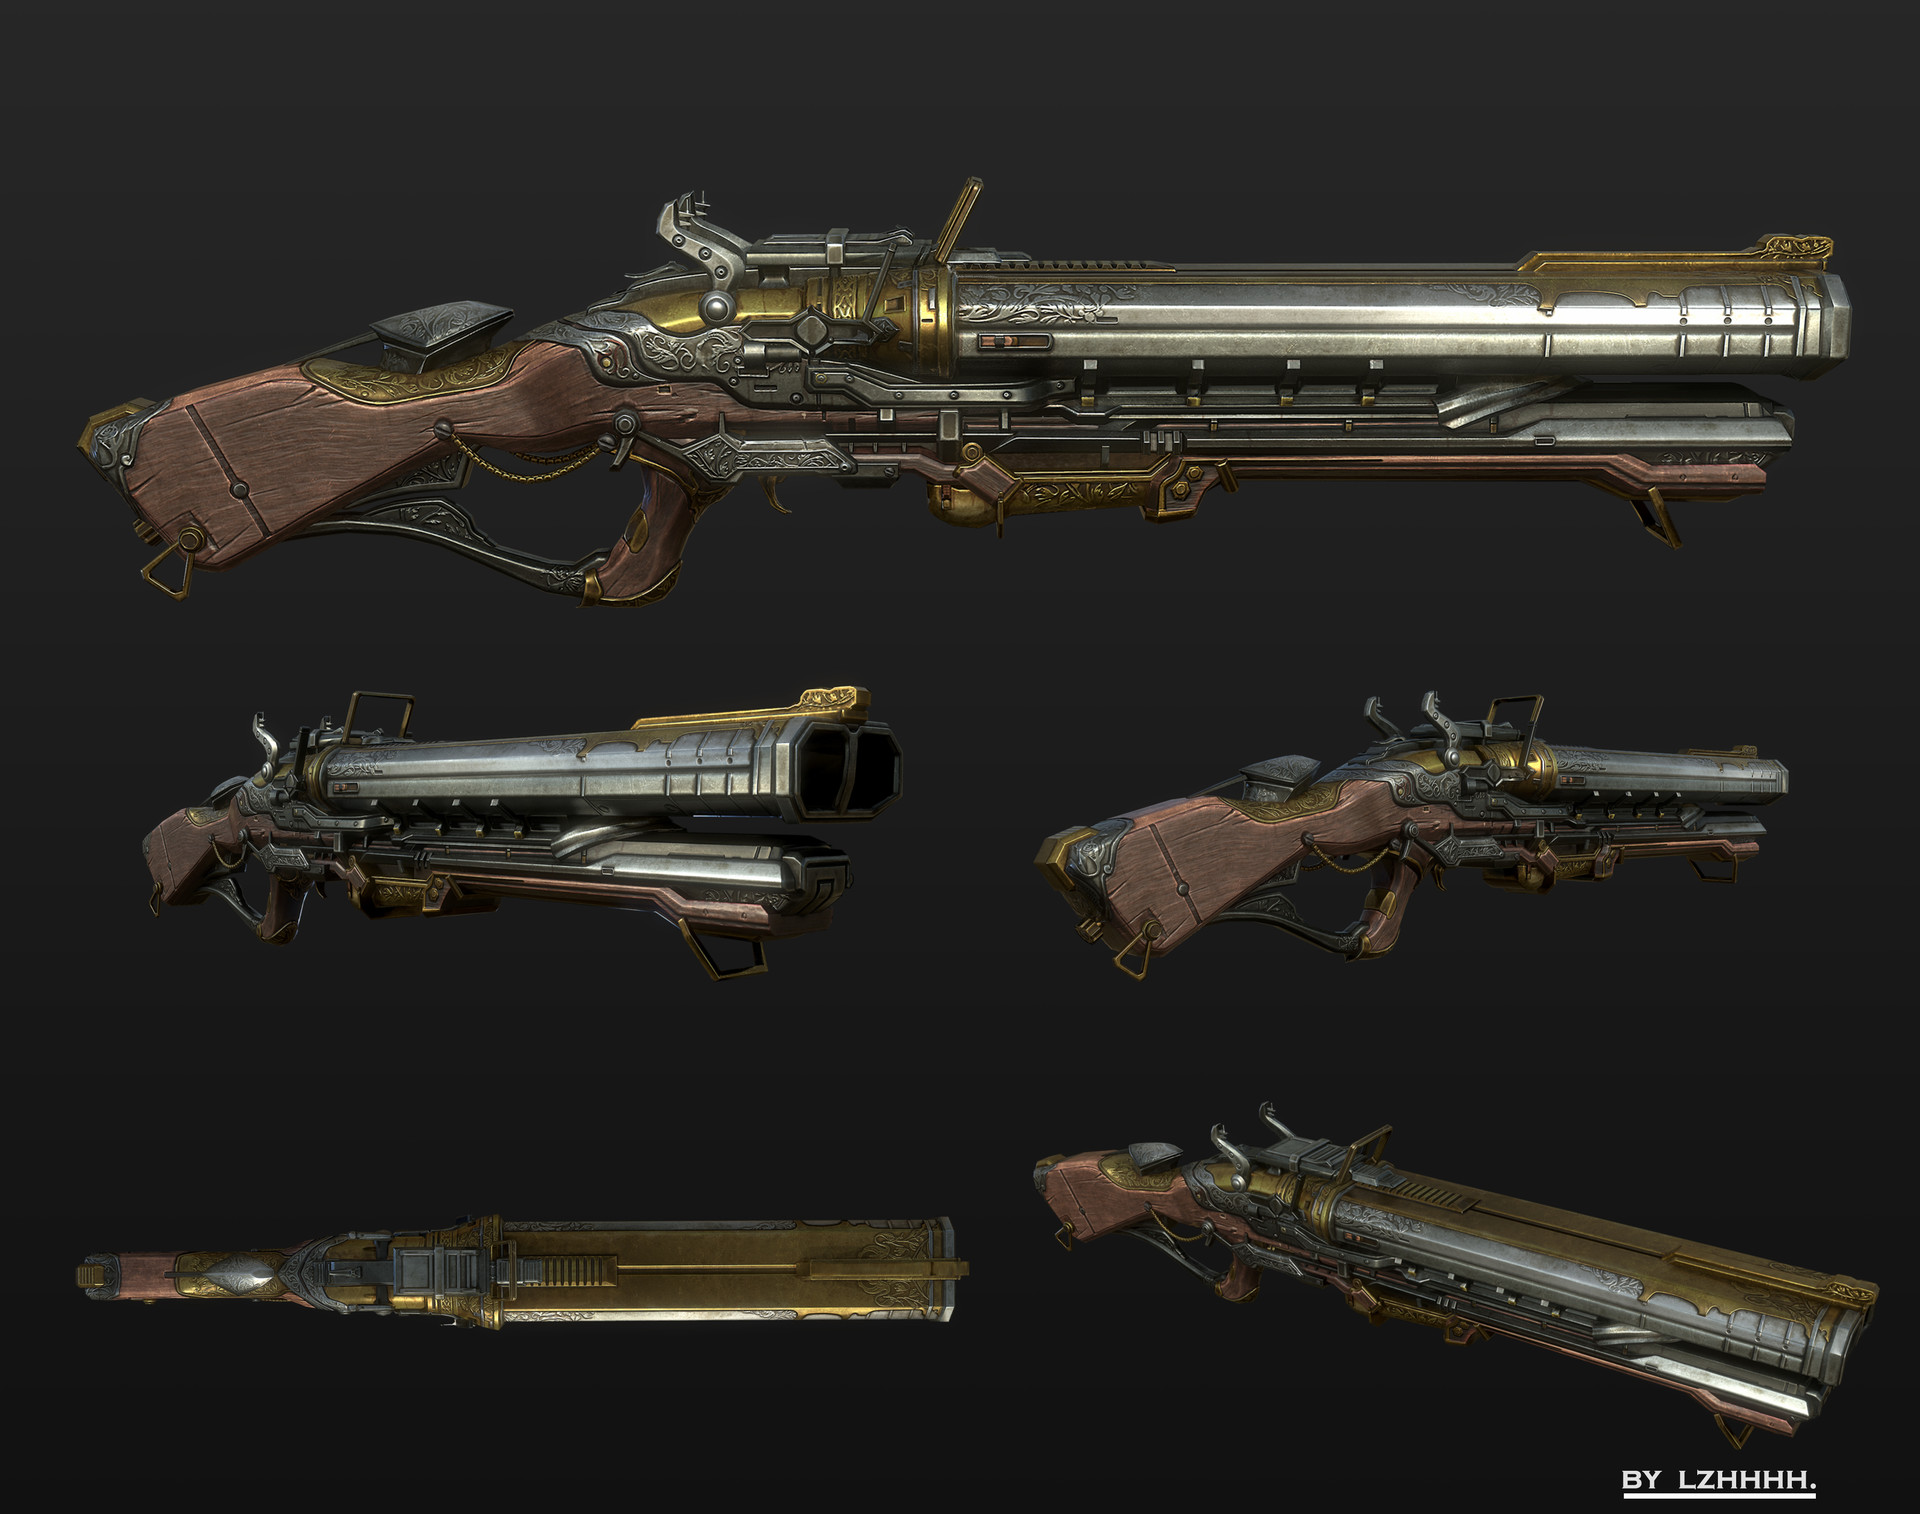 ArtStation - Classic firearms, luo zhenhuai